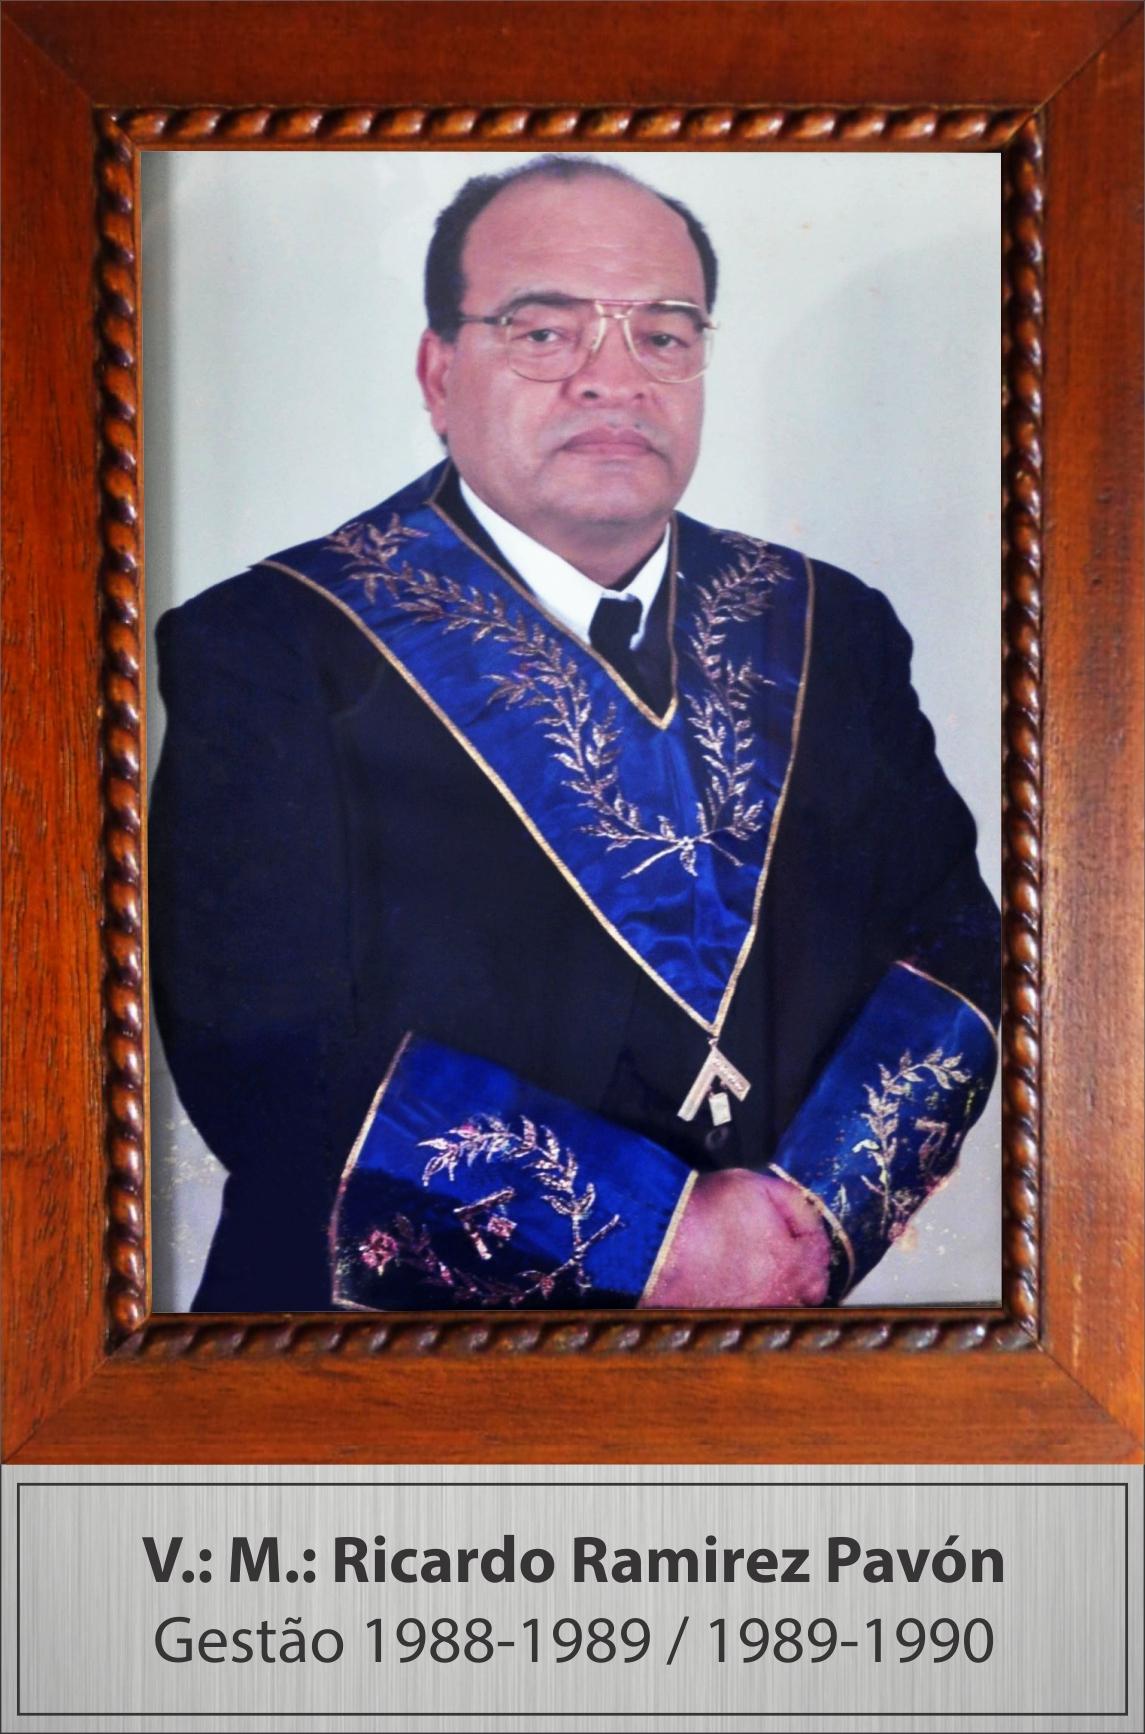 4Ricardo Ramirez